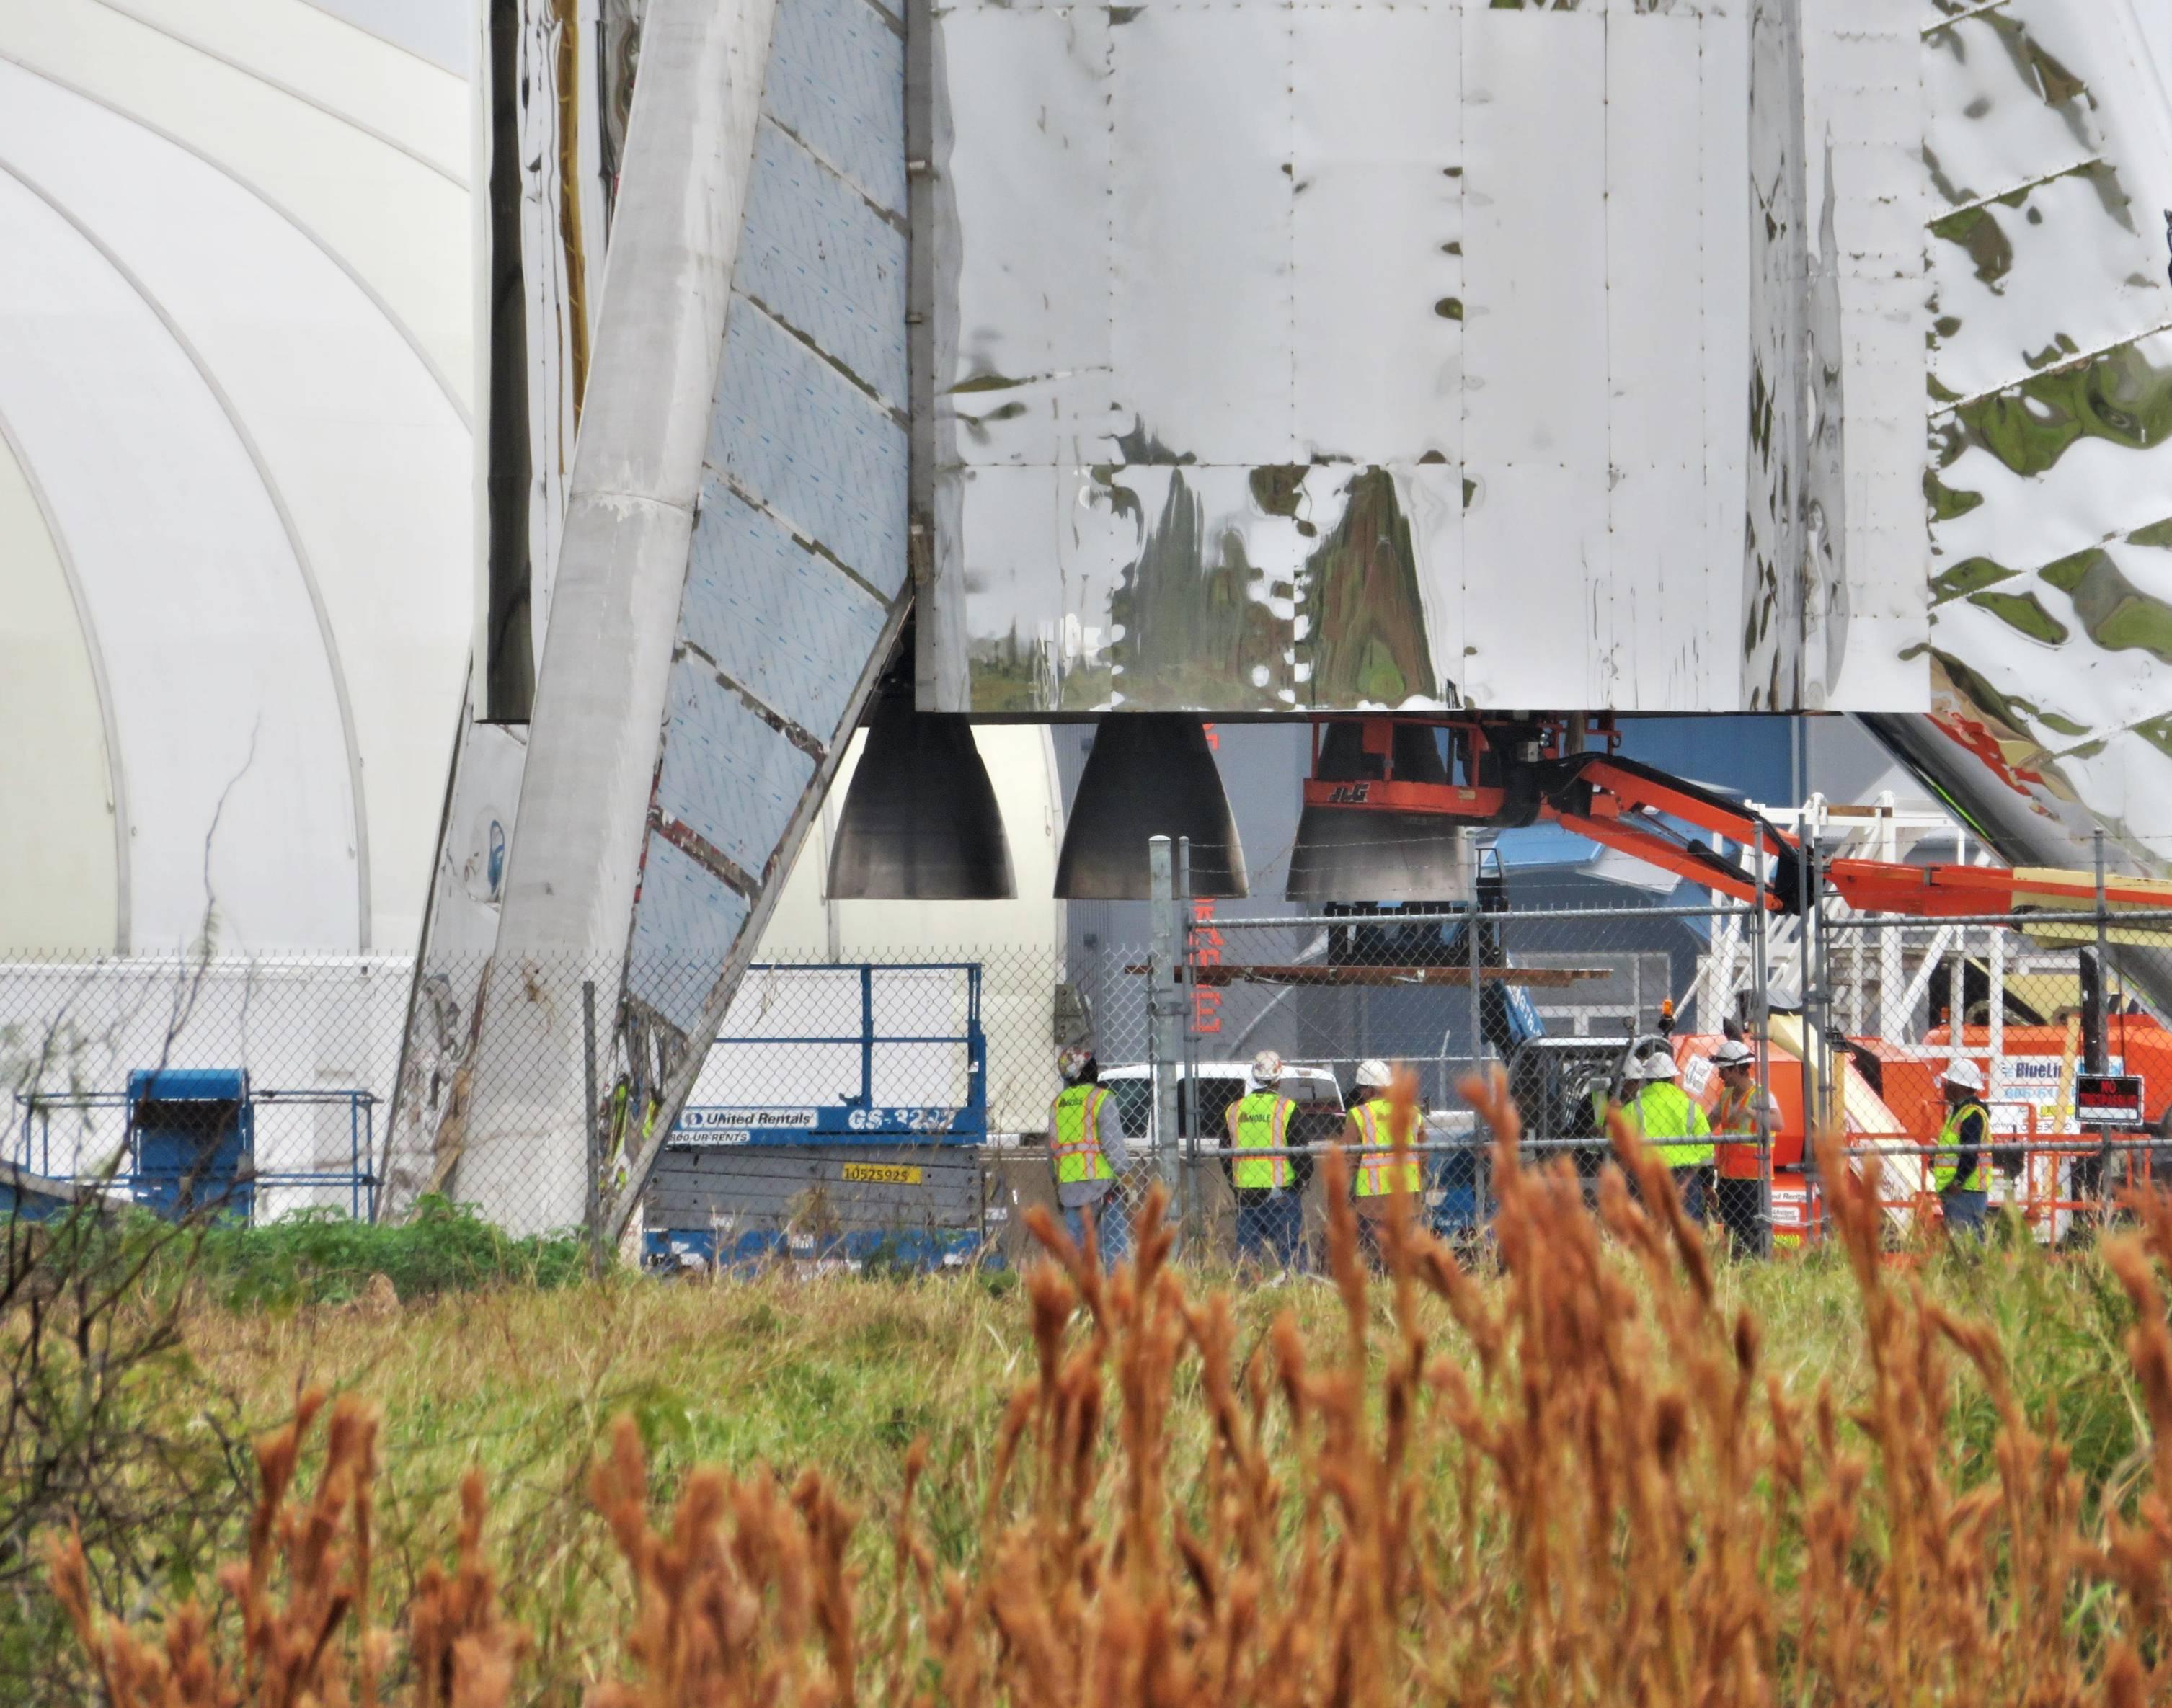 Boca Chica Starship Raptor removal 011519 (NSF – bocachicagal) 1(c)